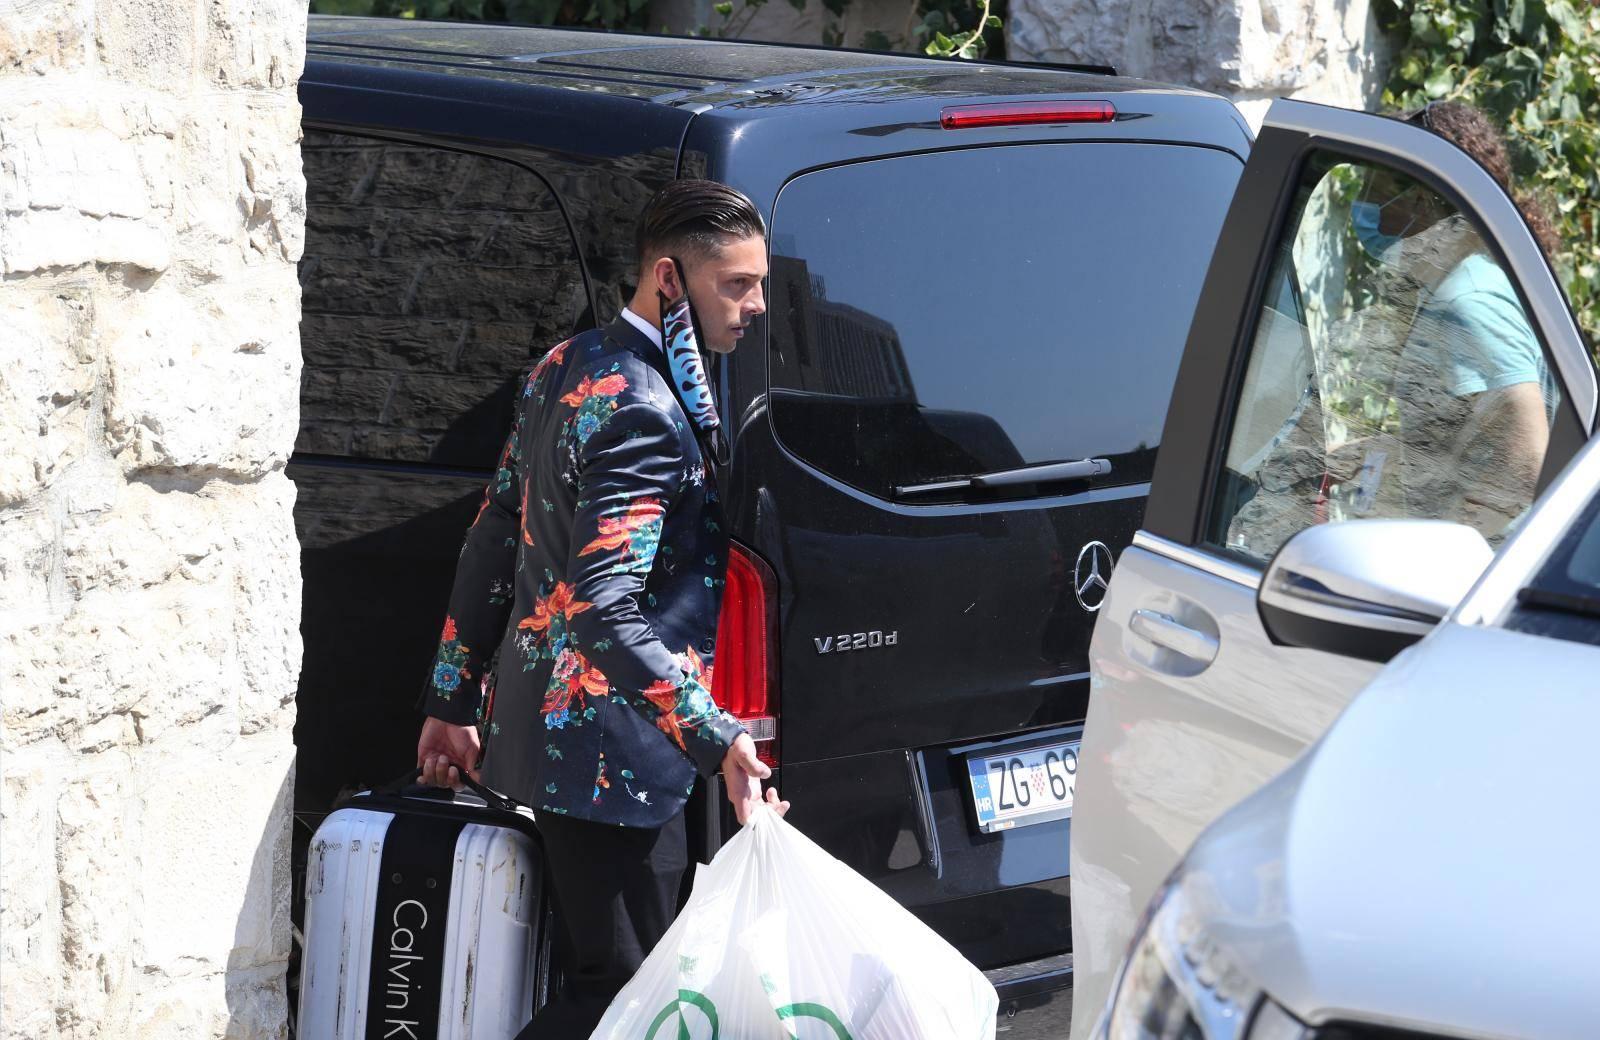 Gay Kardashiani krenuli su u đir po Dalmaciji: Napokon slobodni